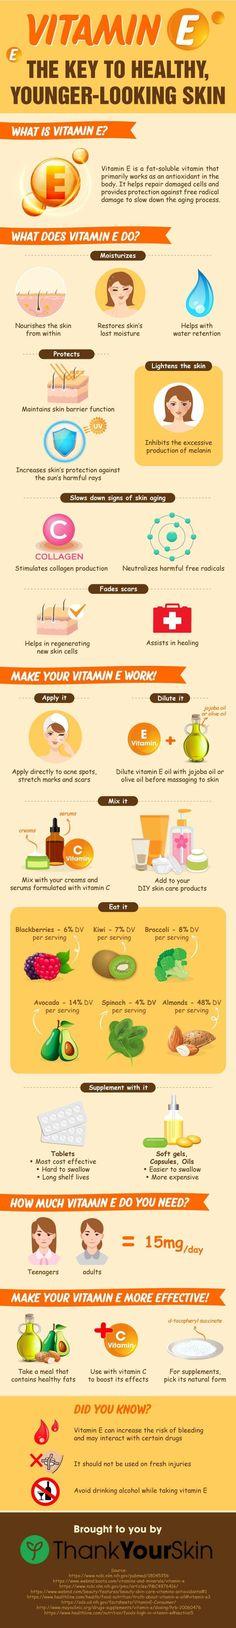 Benefits of Vitamin E Oil, Capsules, Cream for Skin, - For Scar and anti aging, Foods with Vitamin E. #VitaminE #VitaminEforSkin #ThankYourSkin